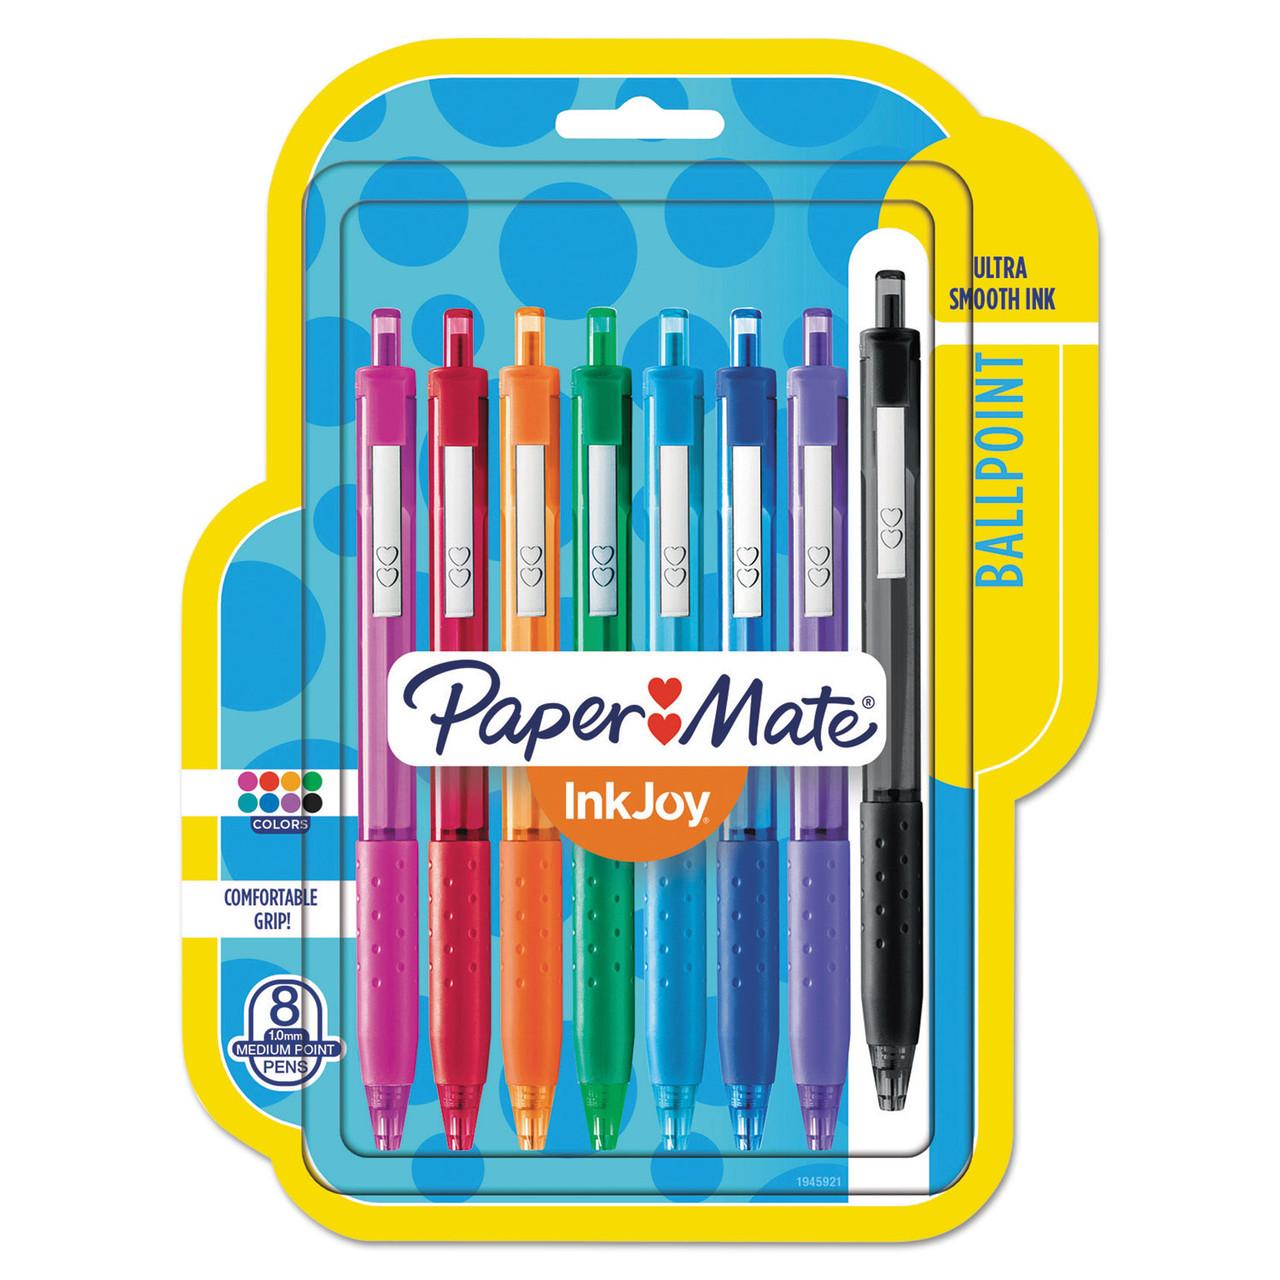 Retractable Colored Pen set